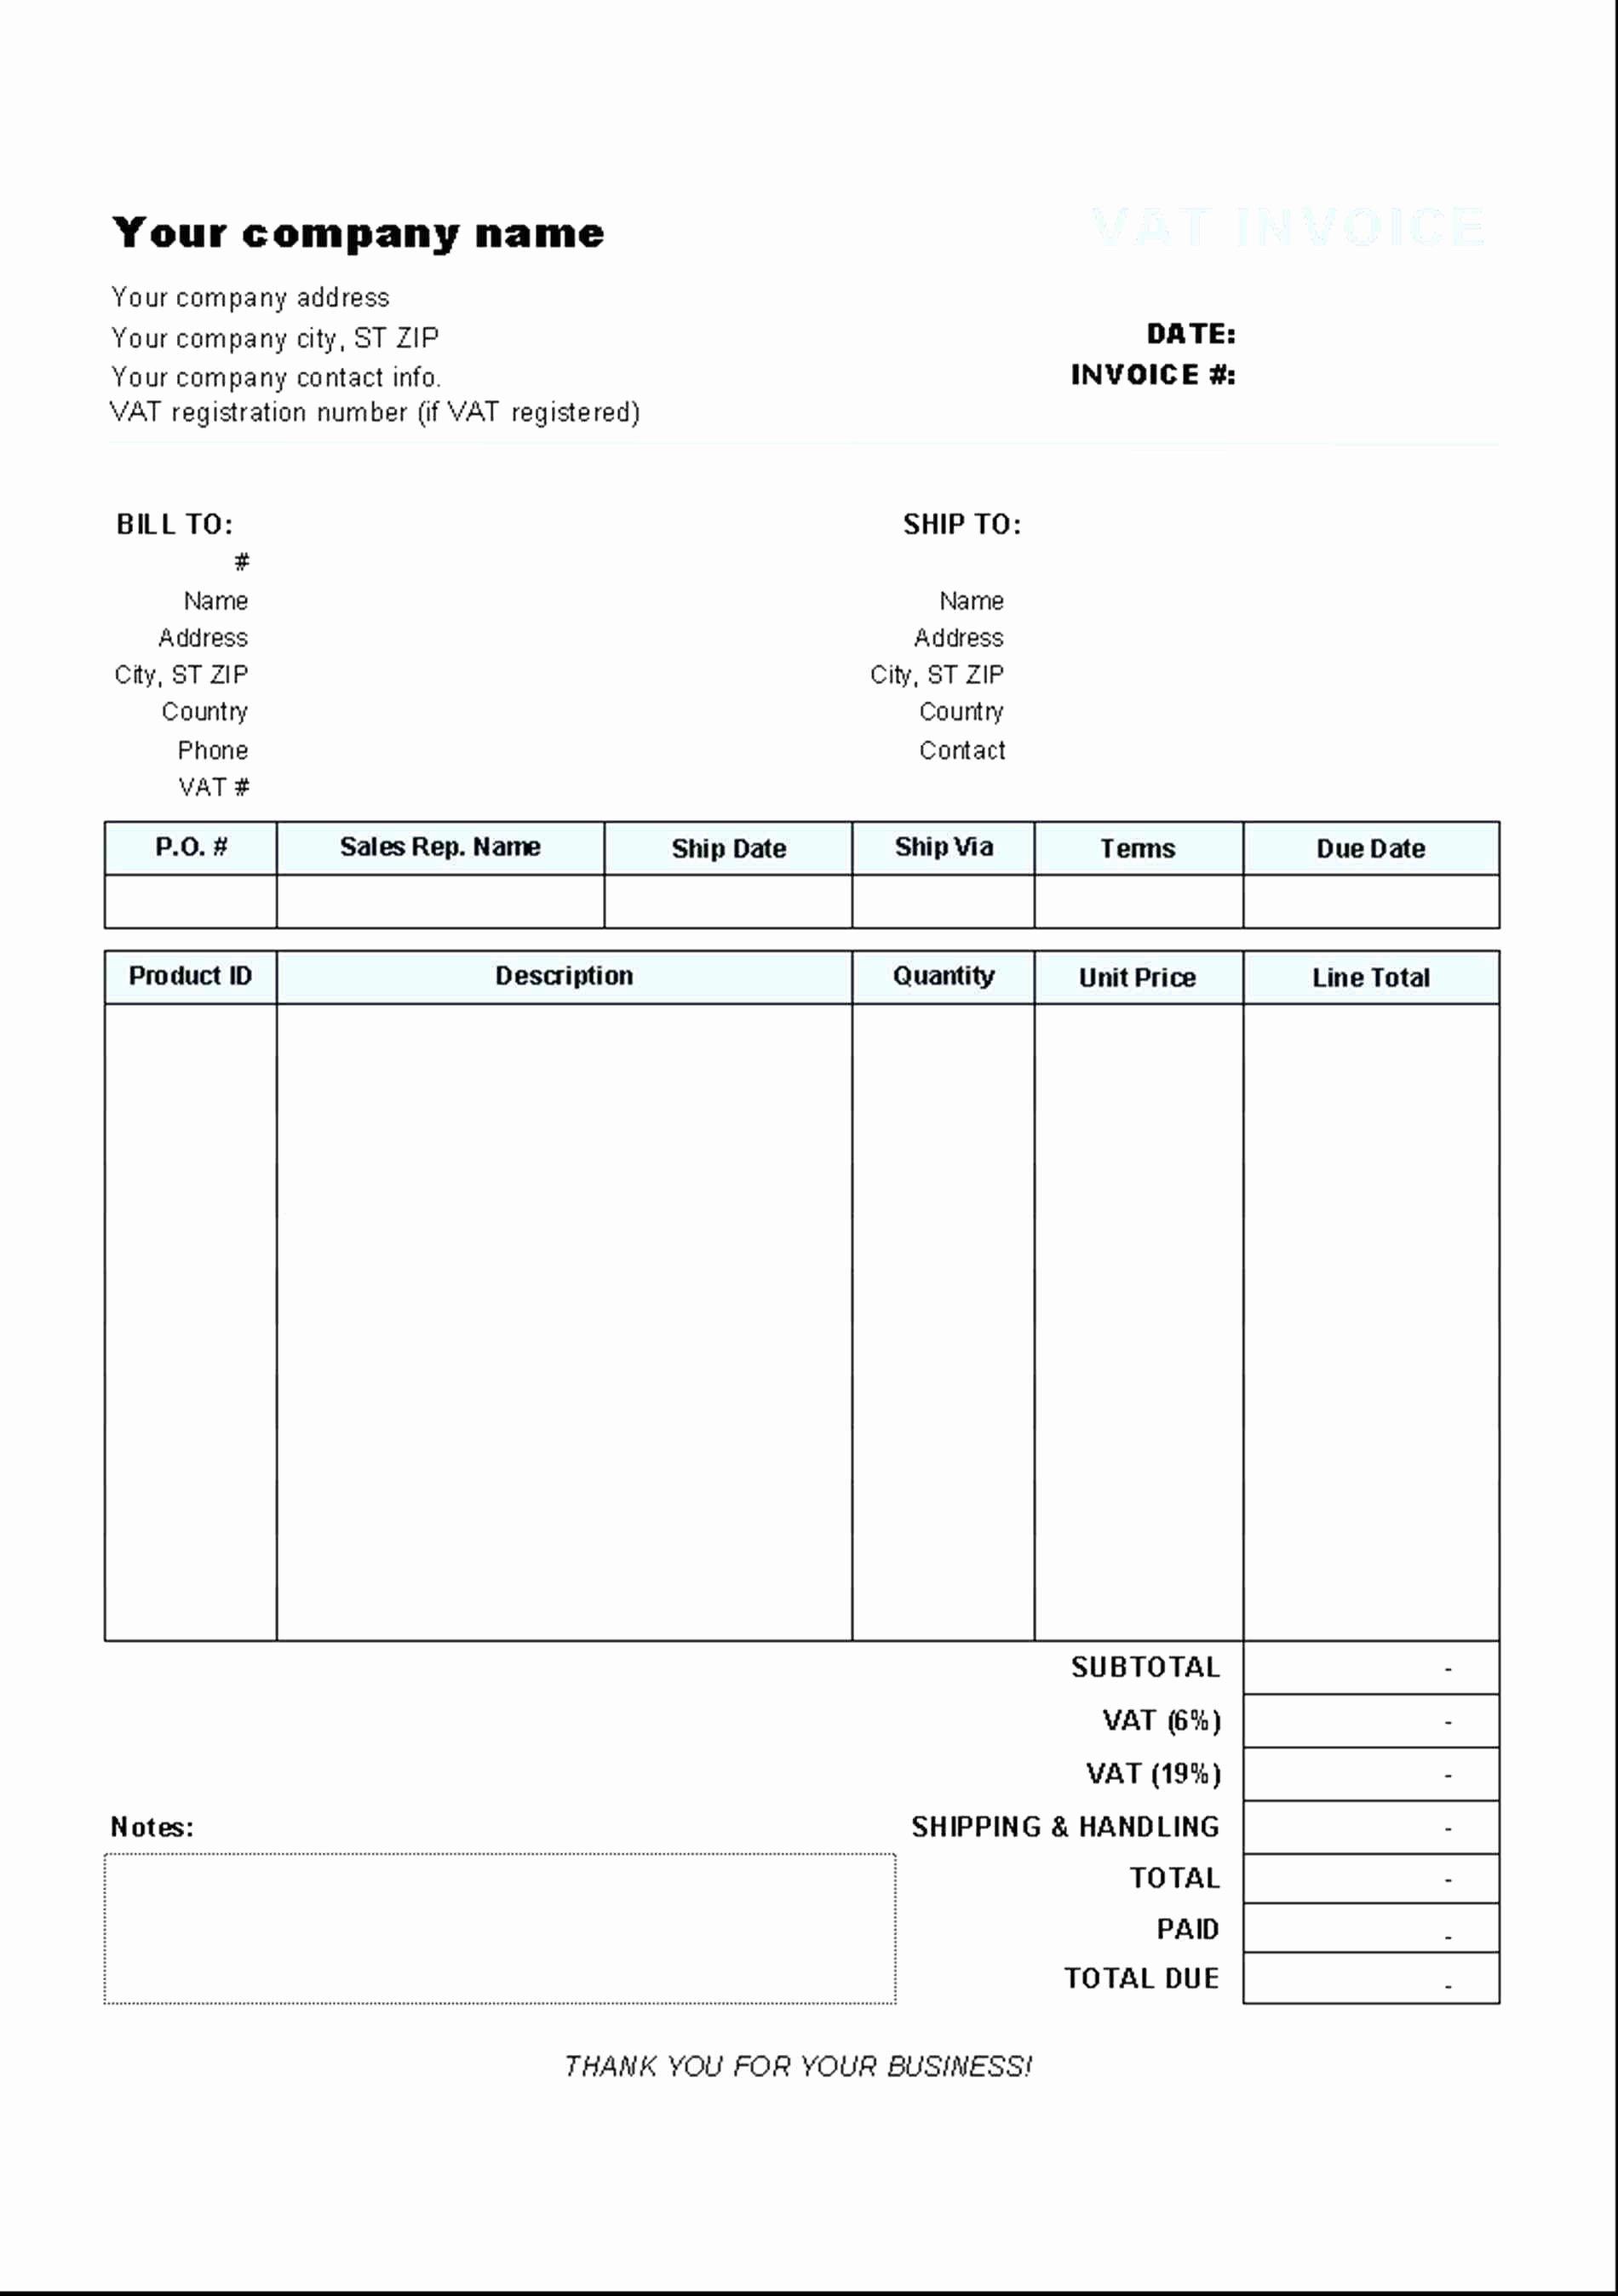 Free Invoice Receipt Template Beautiful Tax Invoice Receipt Template